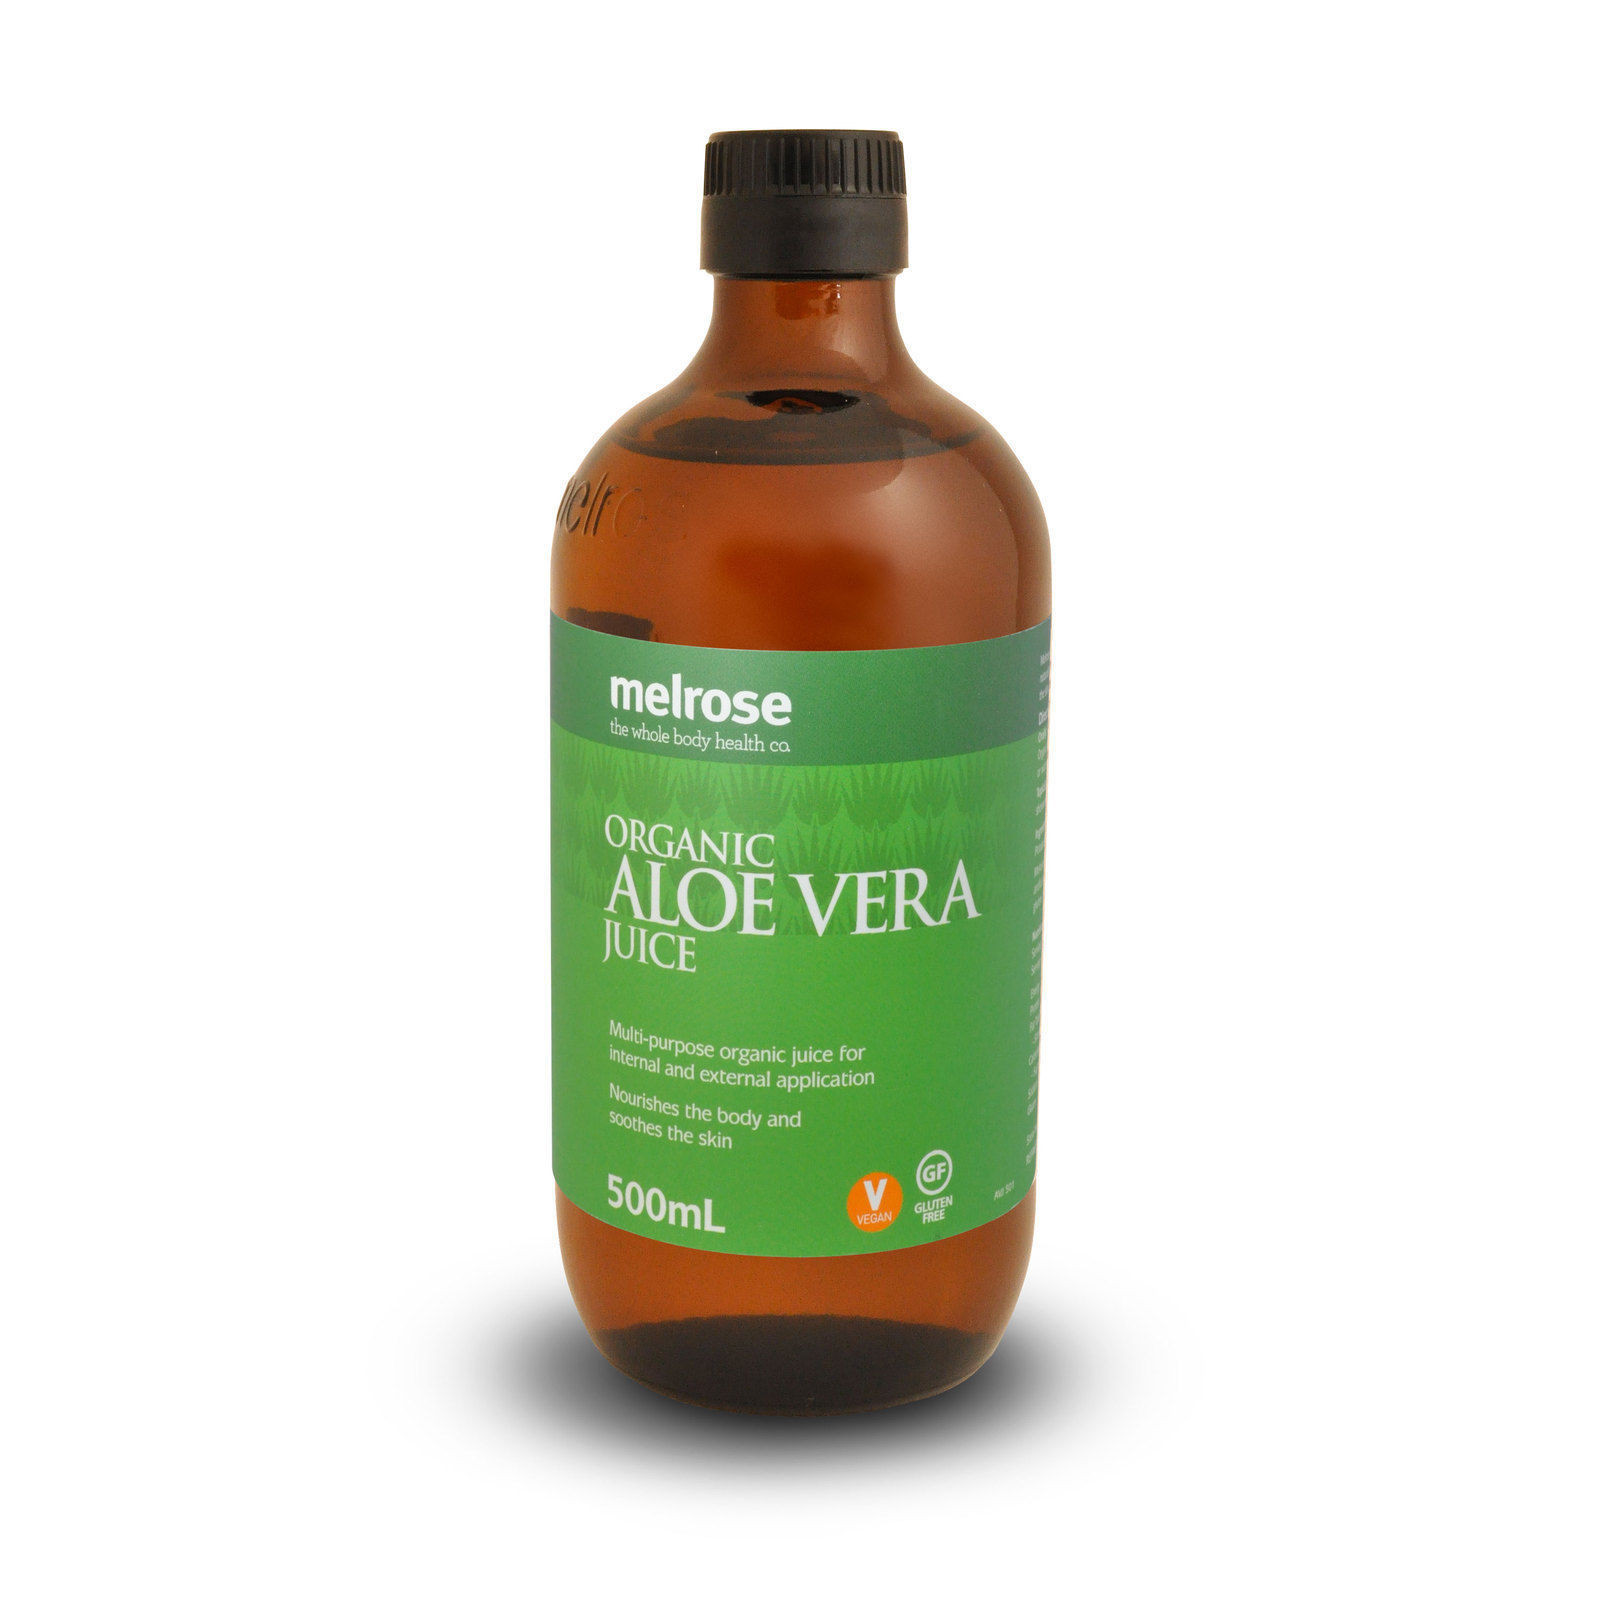 Organic Aloe Vera Juice  Melrose Organic Aloe Vera Juice 500ml Detox Drink Aid